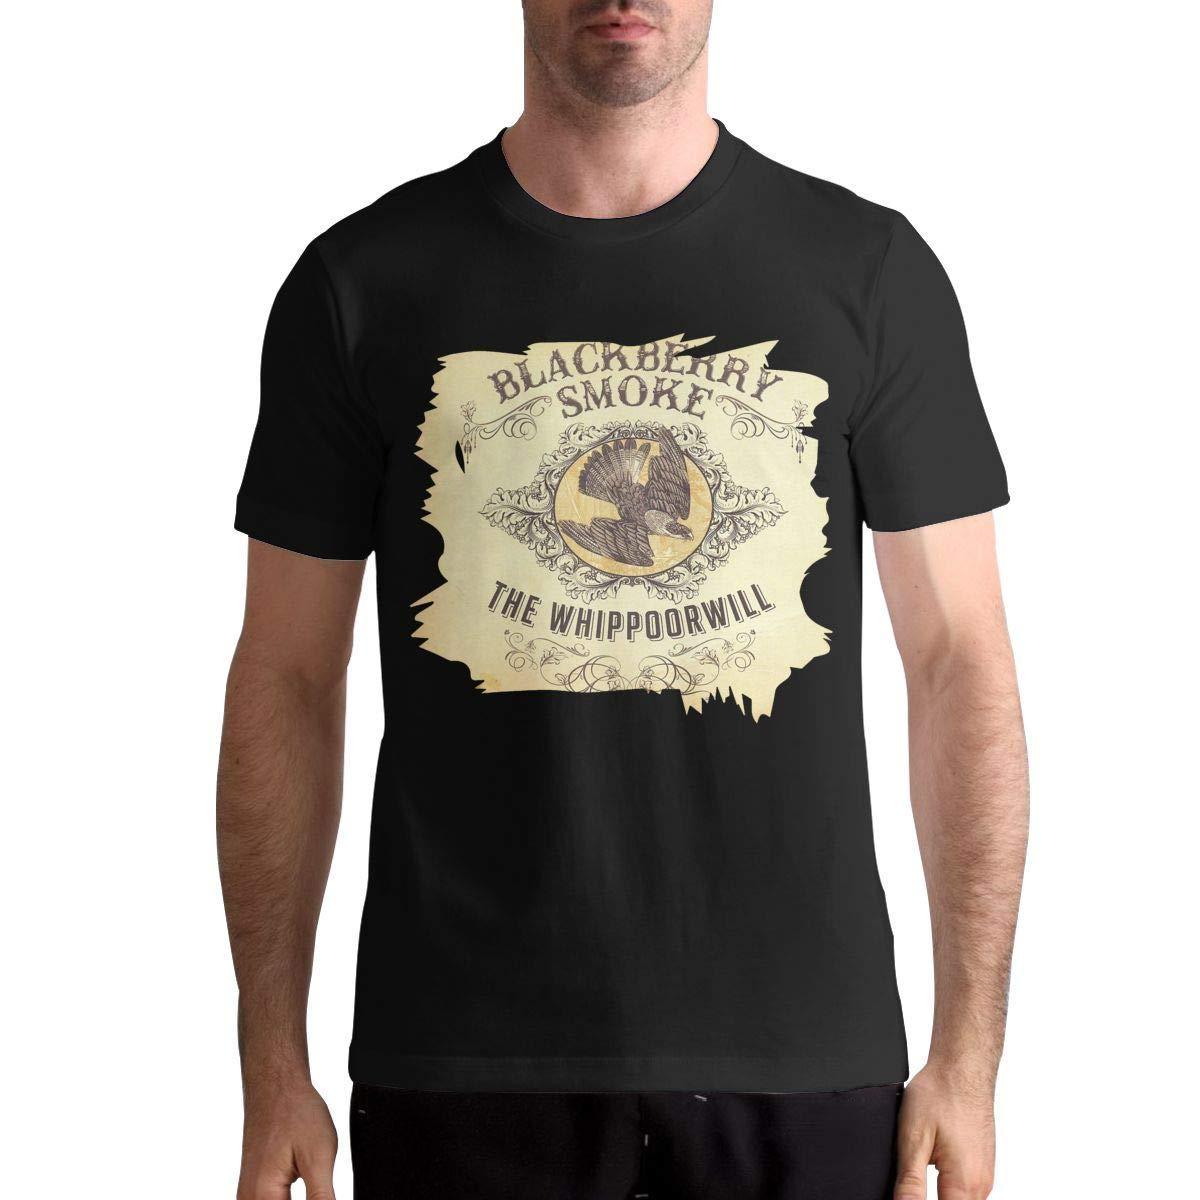 Hye D Riche BlackBerry Smoke-The Whippoorwill Men Fashion Short Sleeve Music Band Shirts Shirt Black